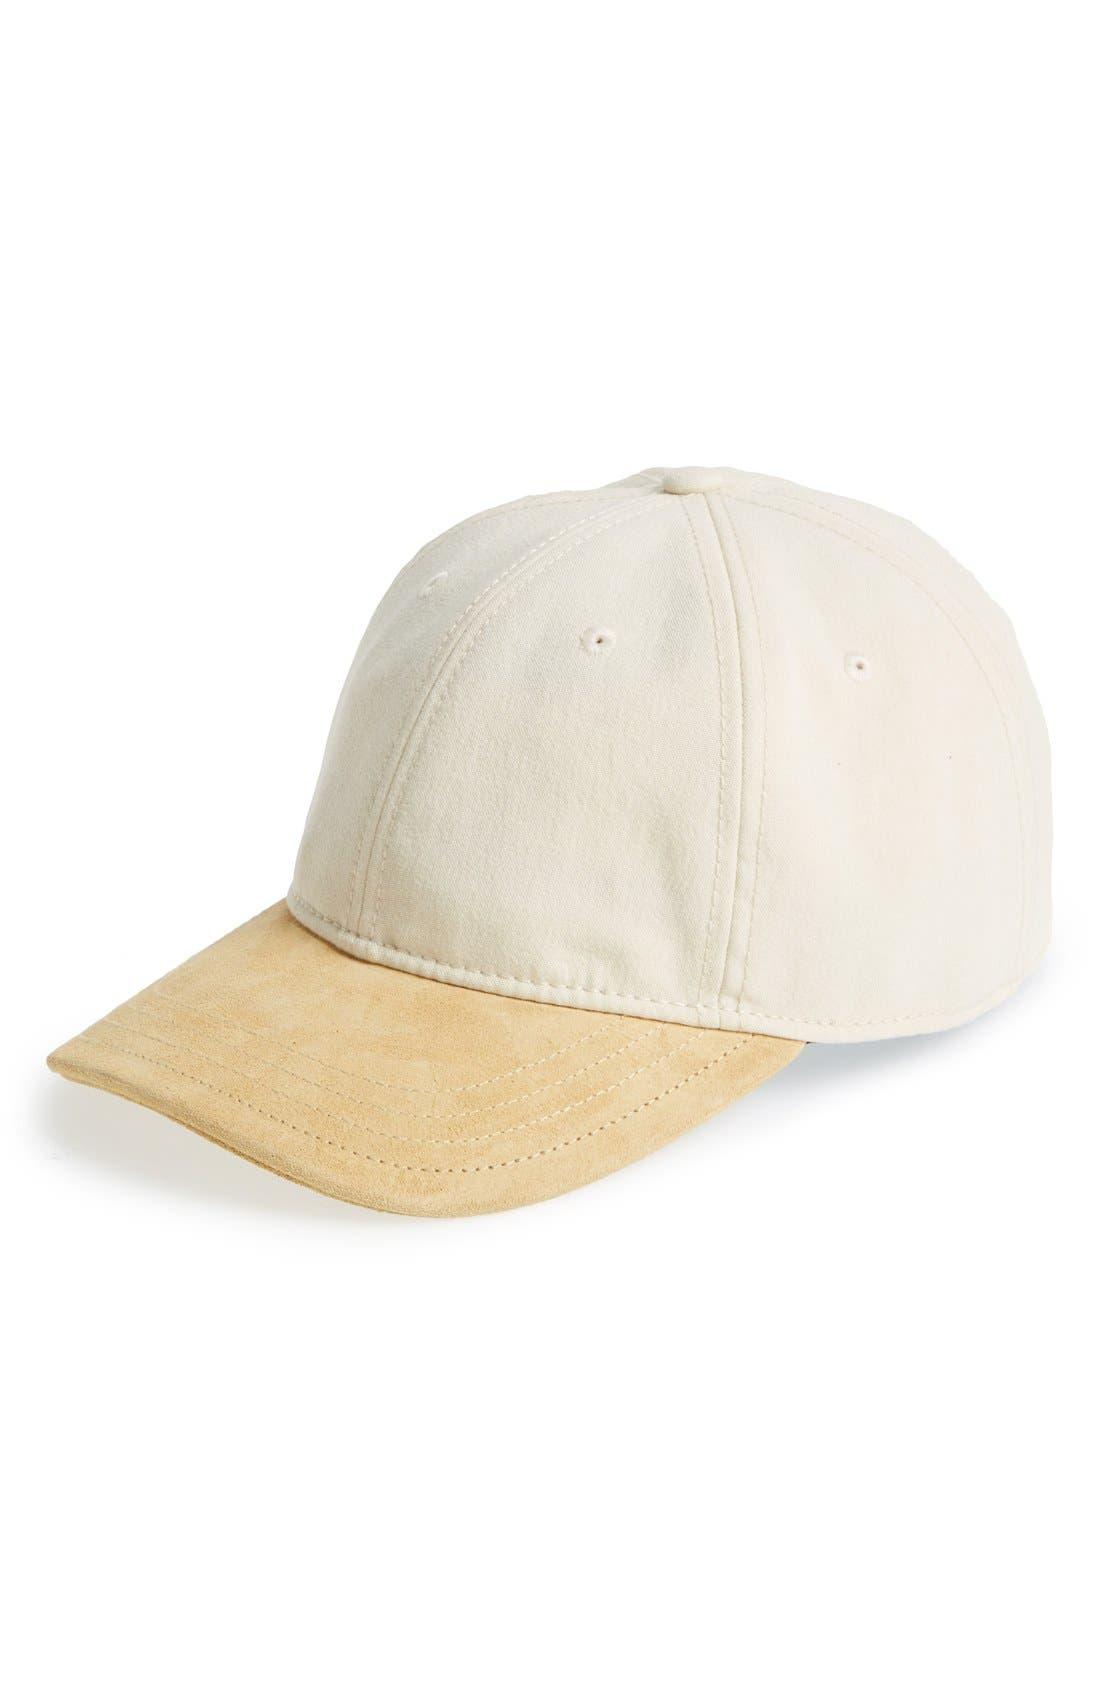 Main Image - rag & bone Leather Brim Adjustable Baseball Cap